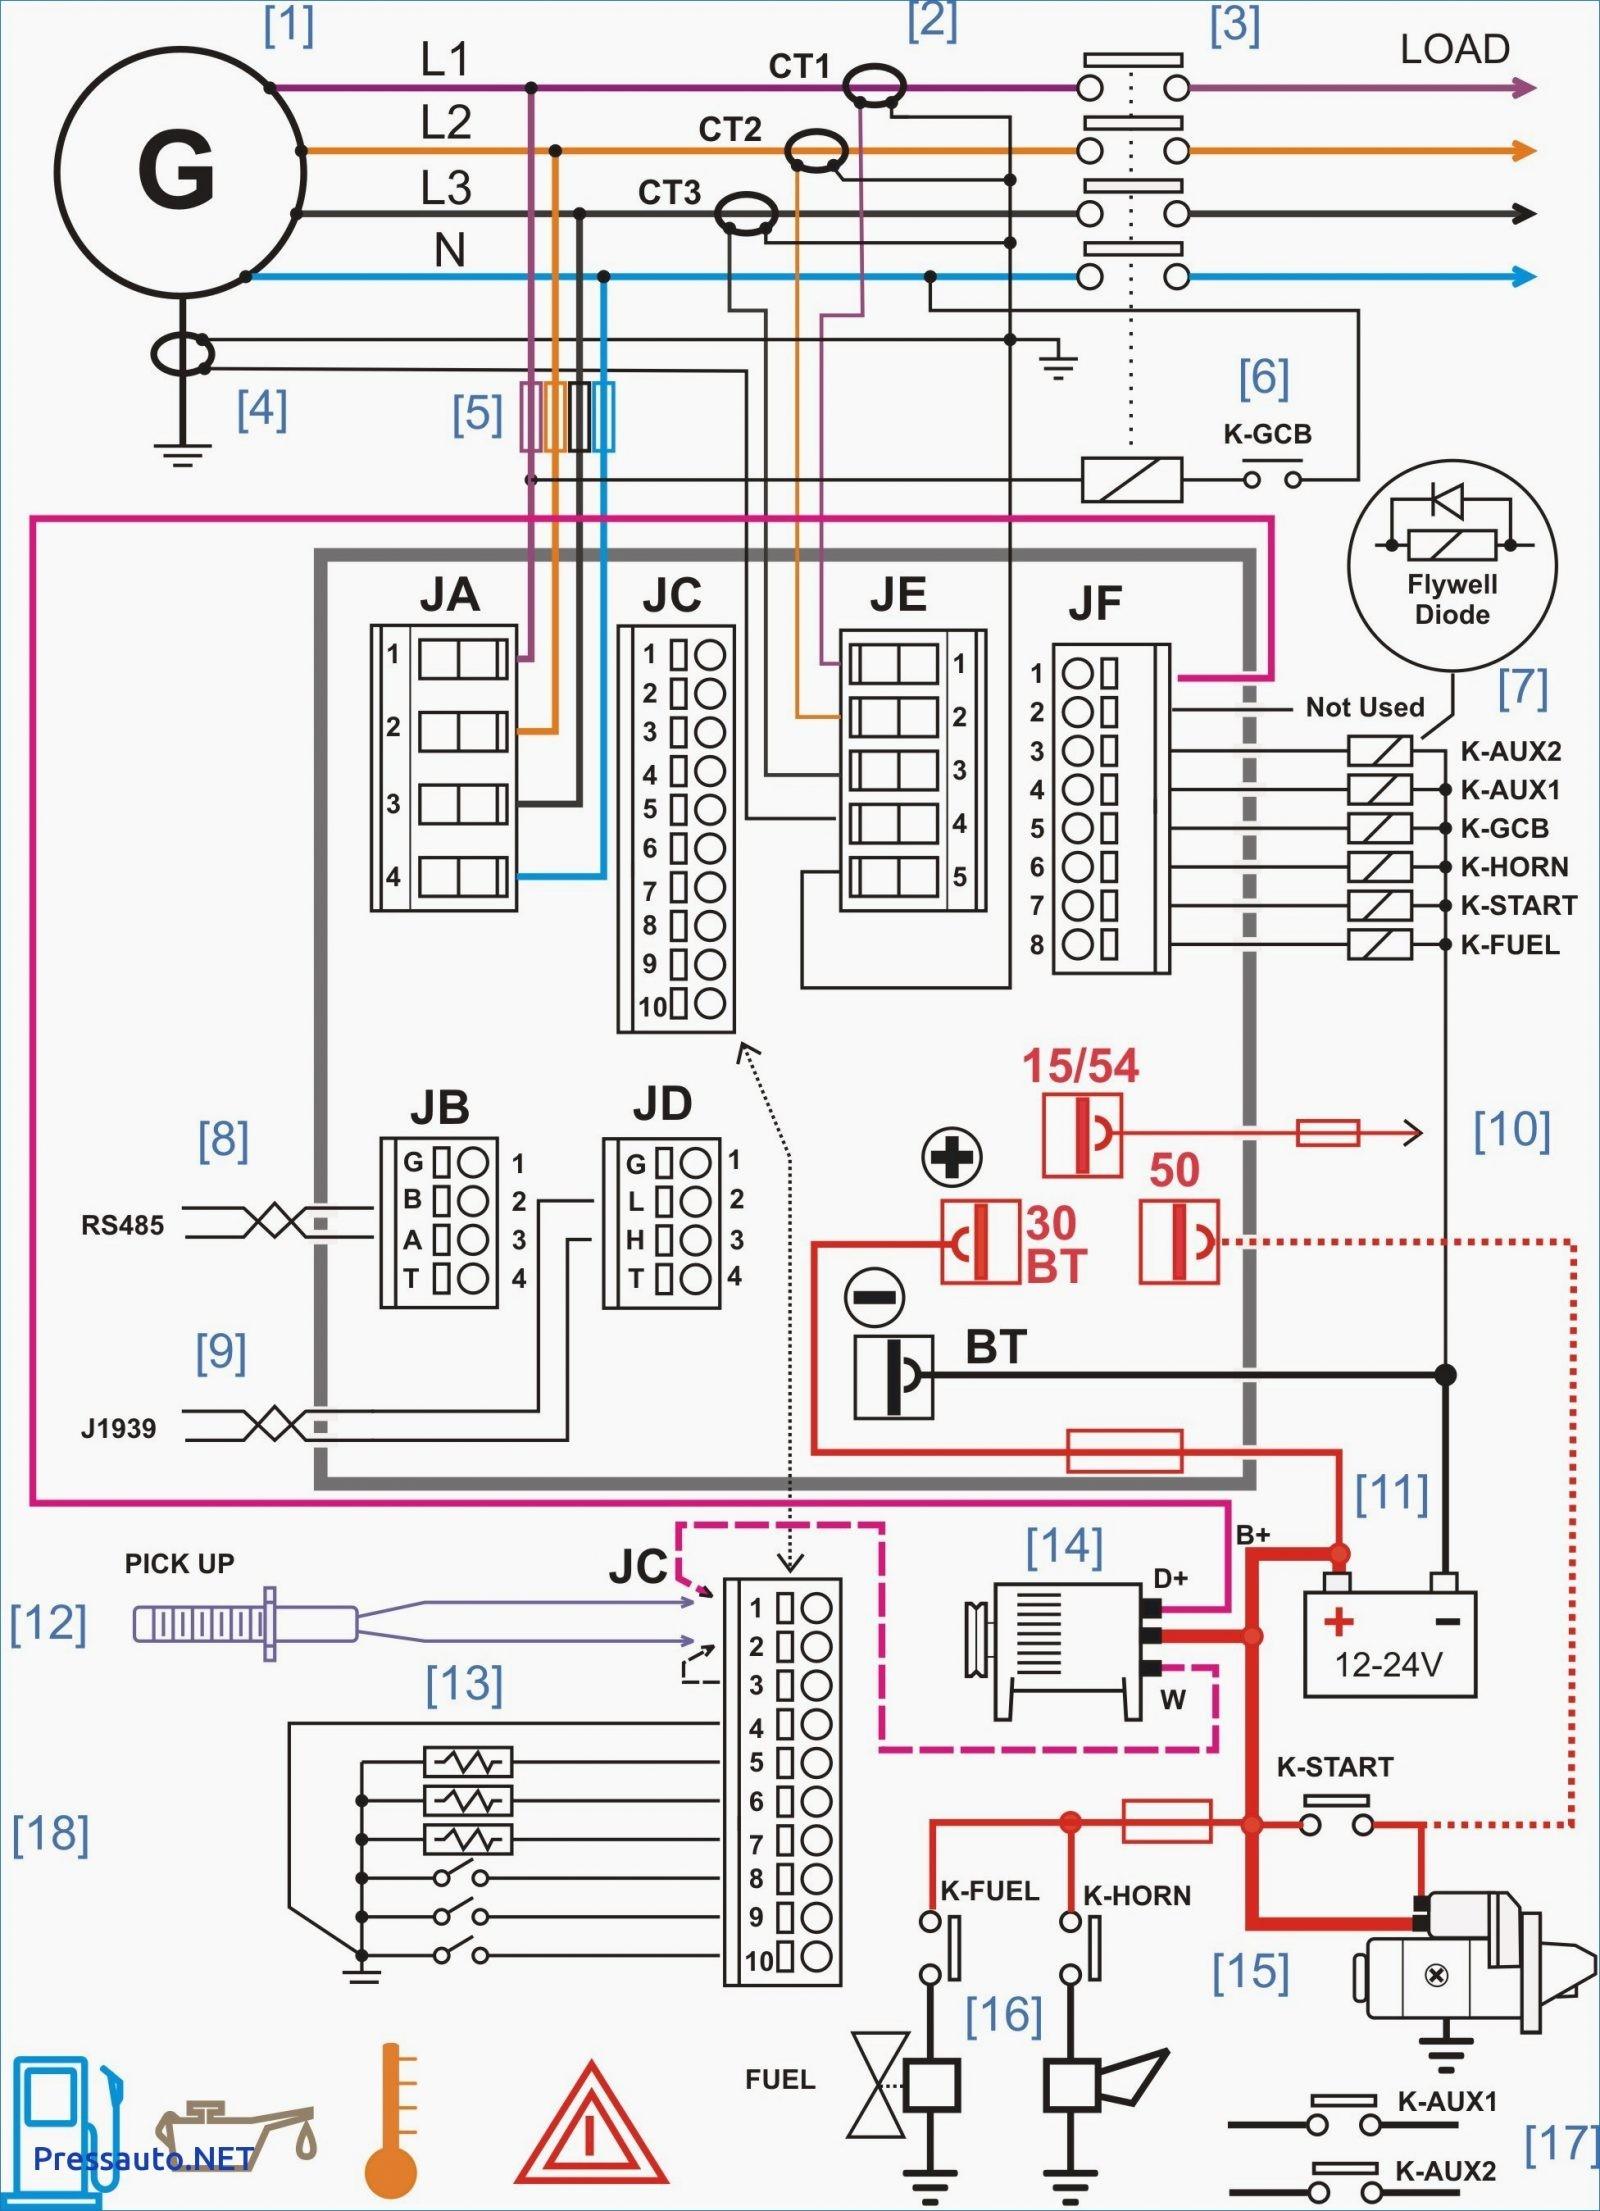 Auto Transfer Switch Wiring Diagram Schematic Pressauto Net At Generator Manual For Perkins Control Generac 100